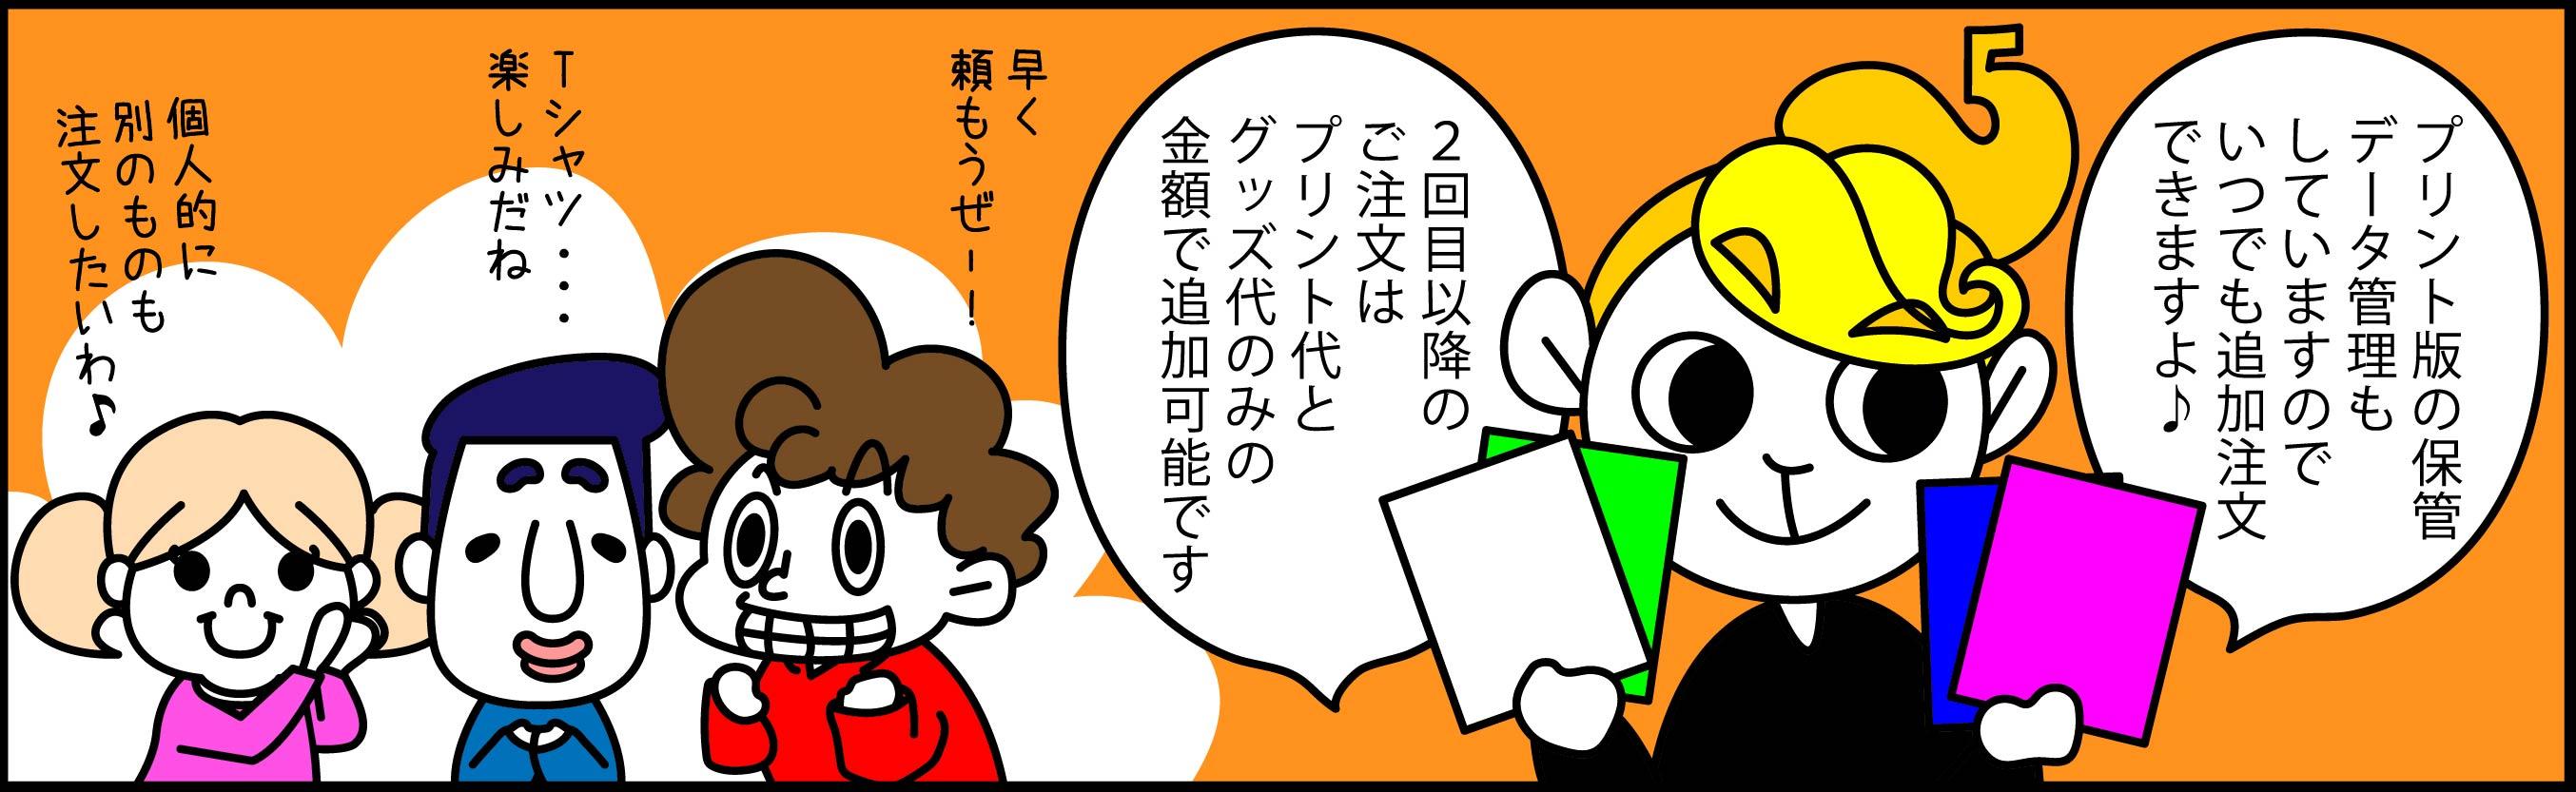 HP漫画2-07